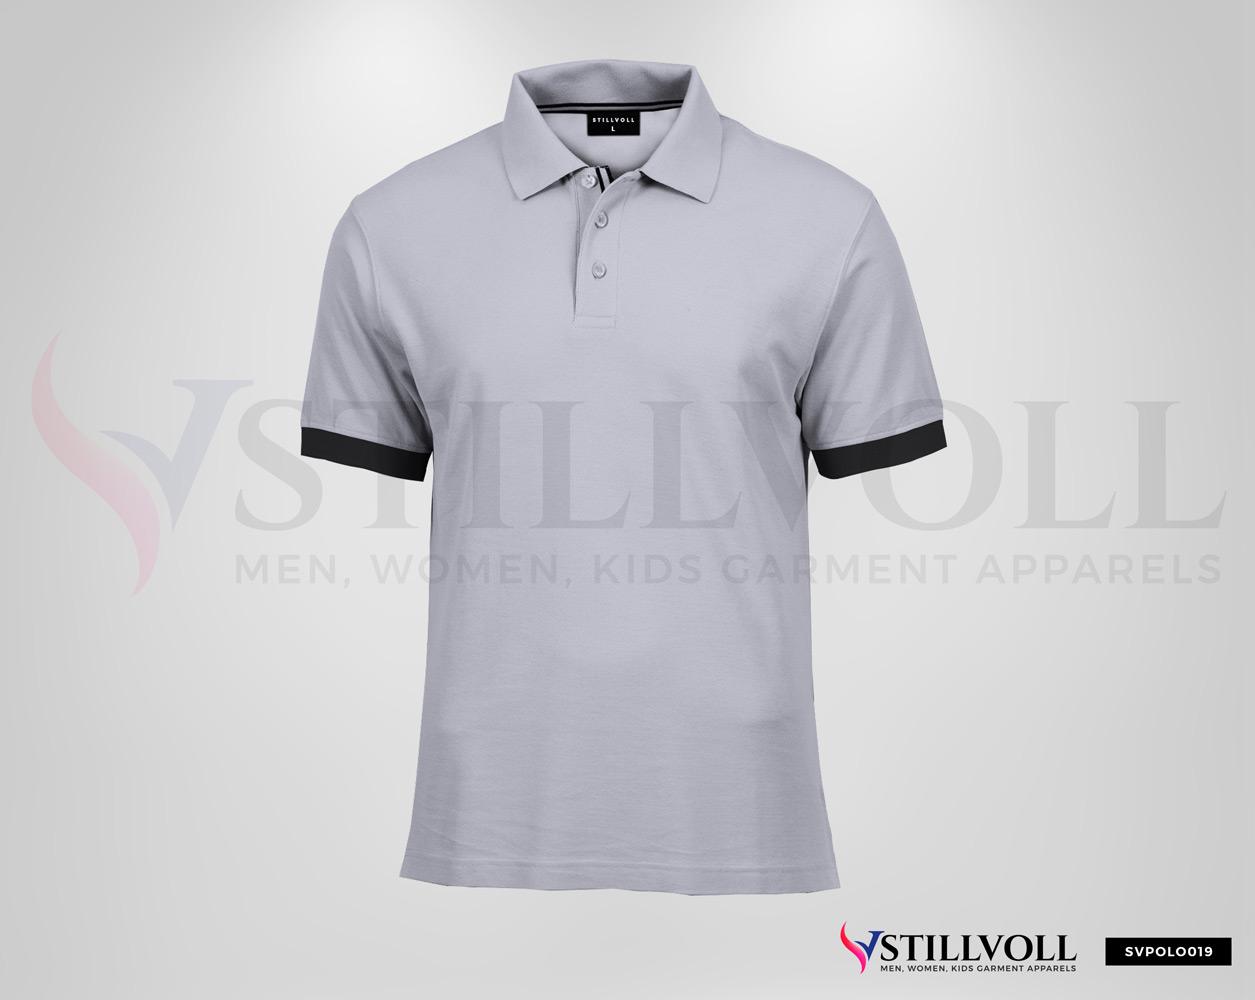 f0ebe4f051be8 Plain T Shirts Manufacturers In Tirupur - BCD Tofu House